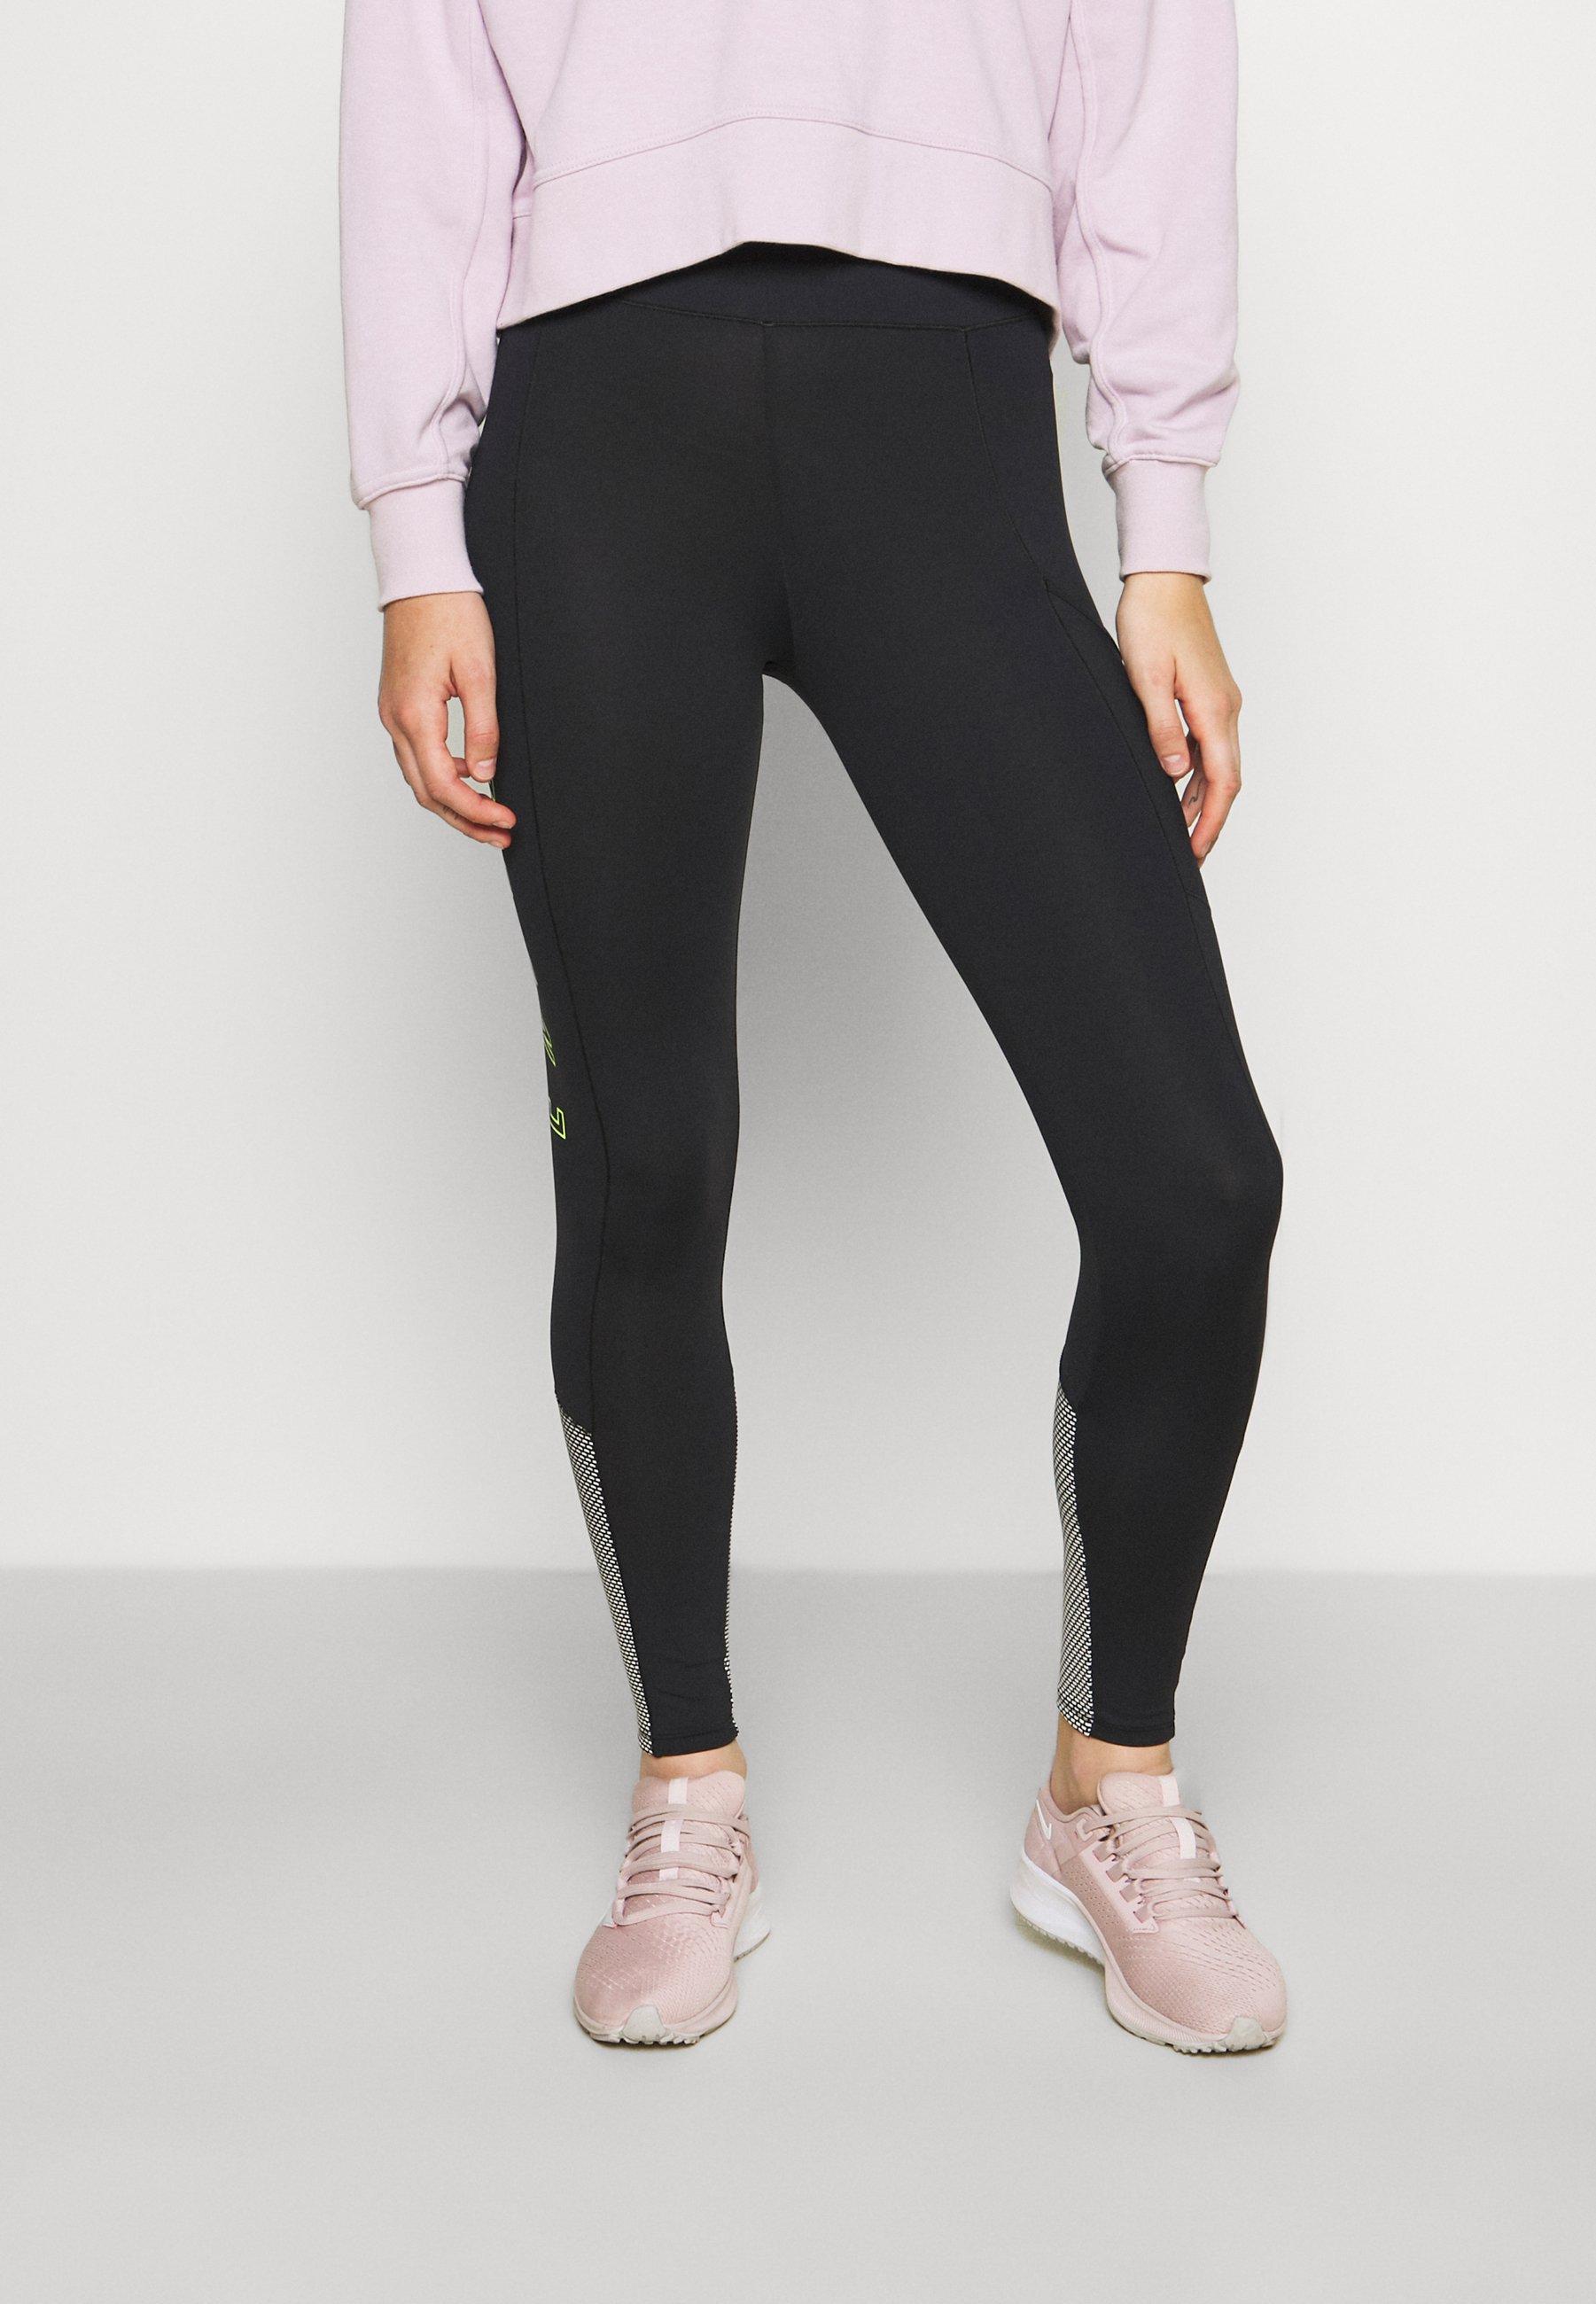 Femme MALLAS LIFT - Collants